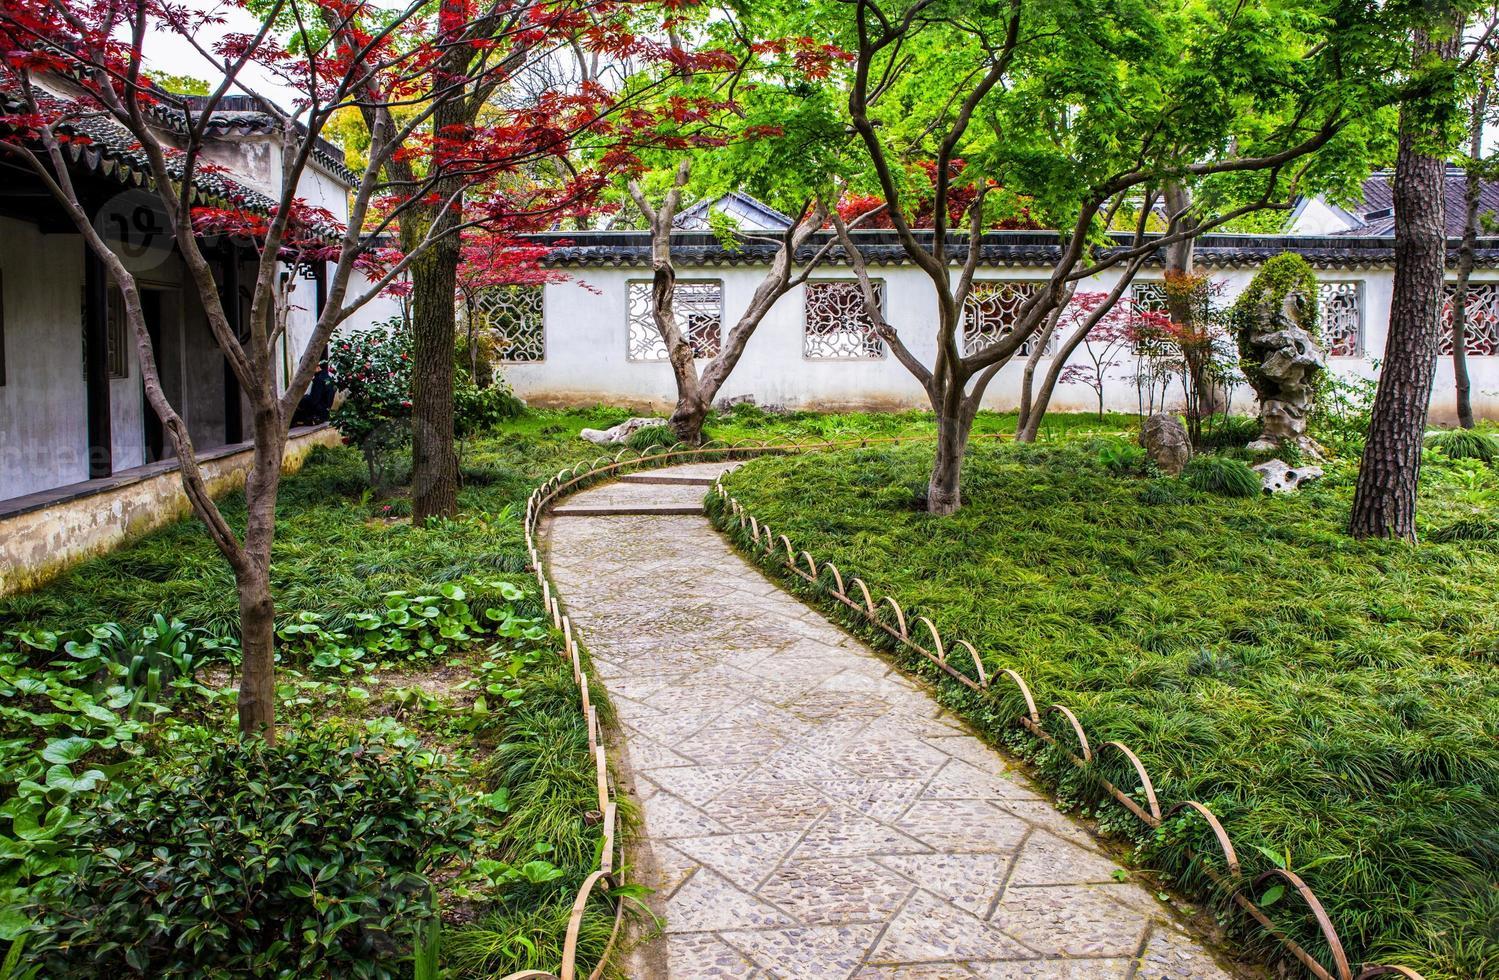 jardin de l'humble administrateur (zhuozheng) photo